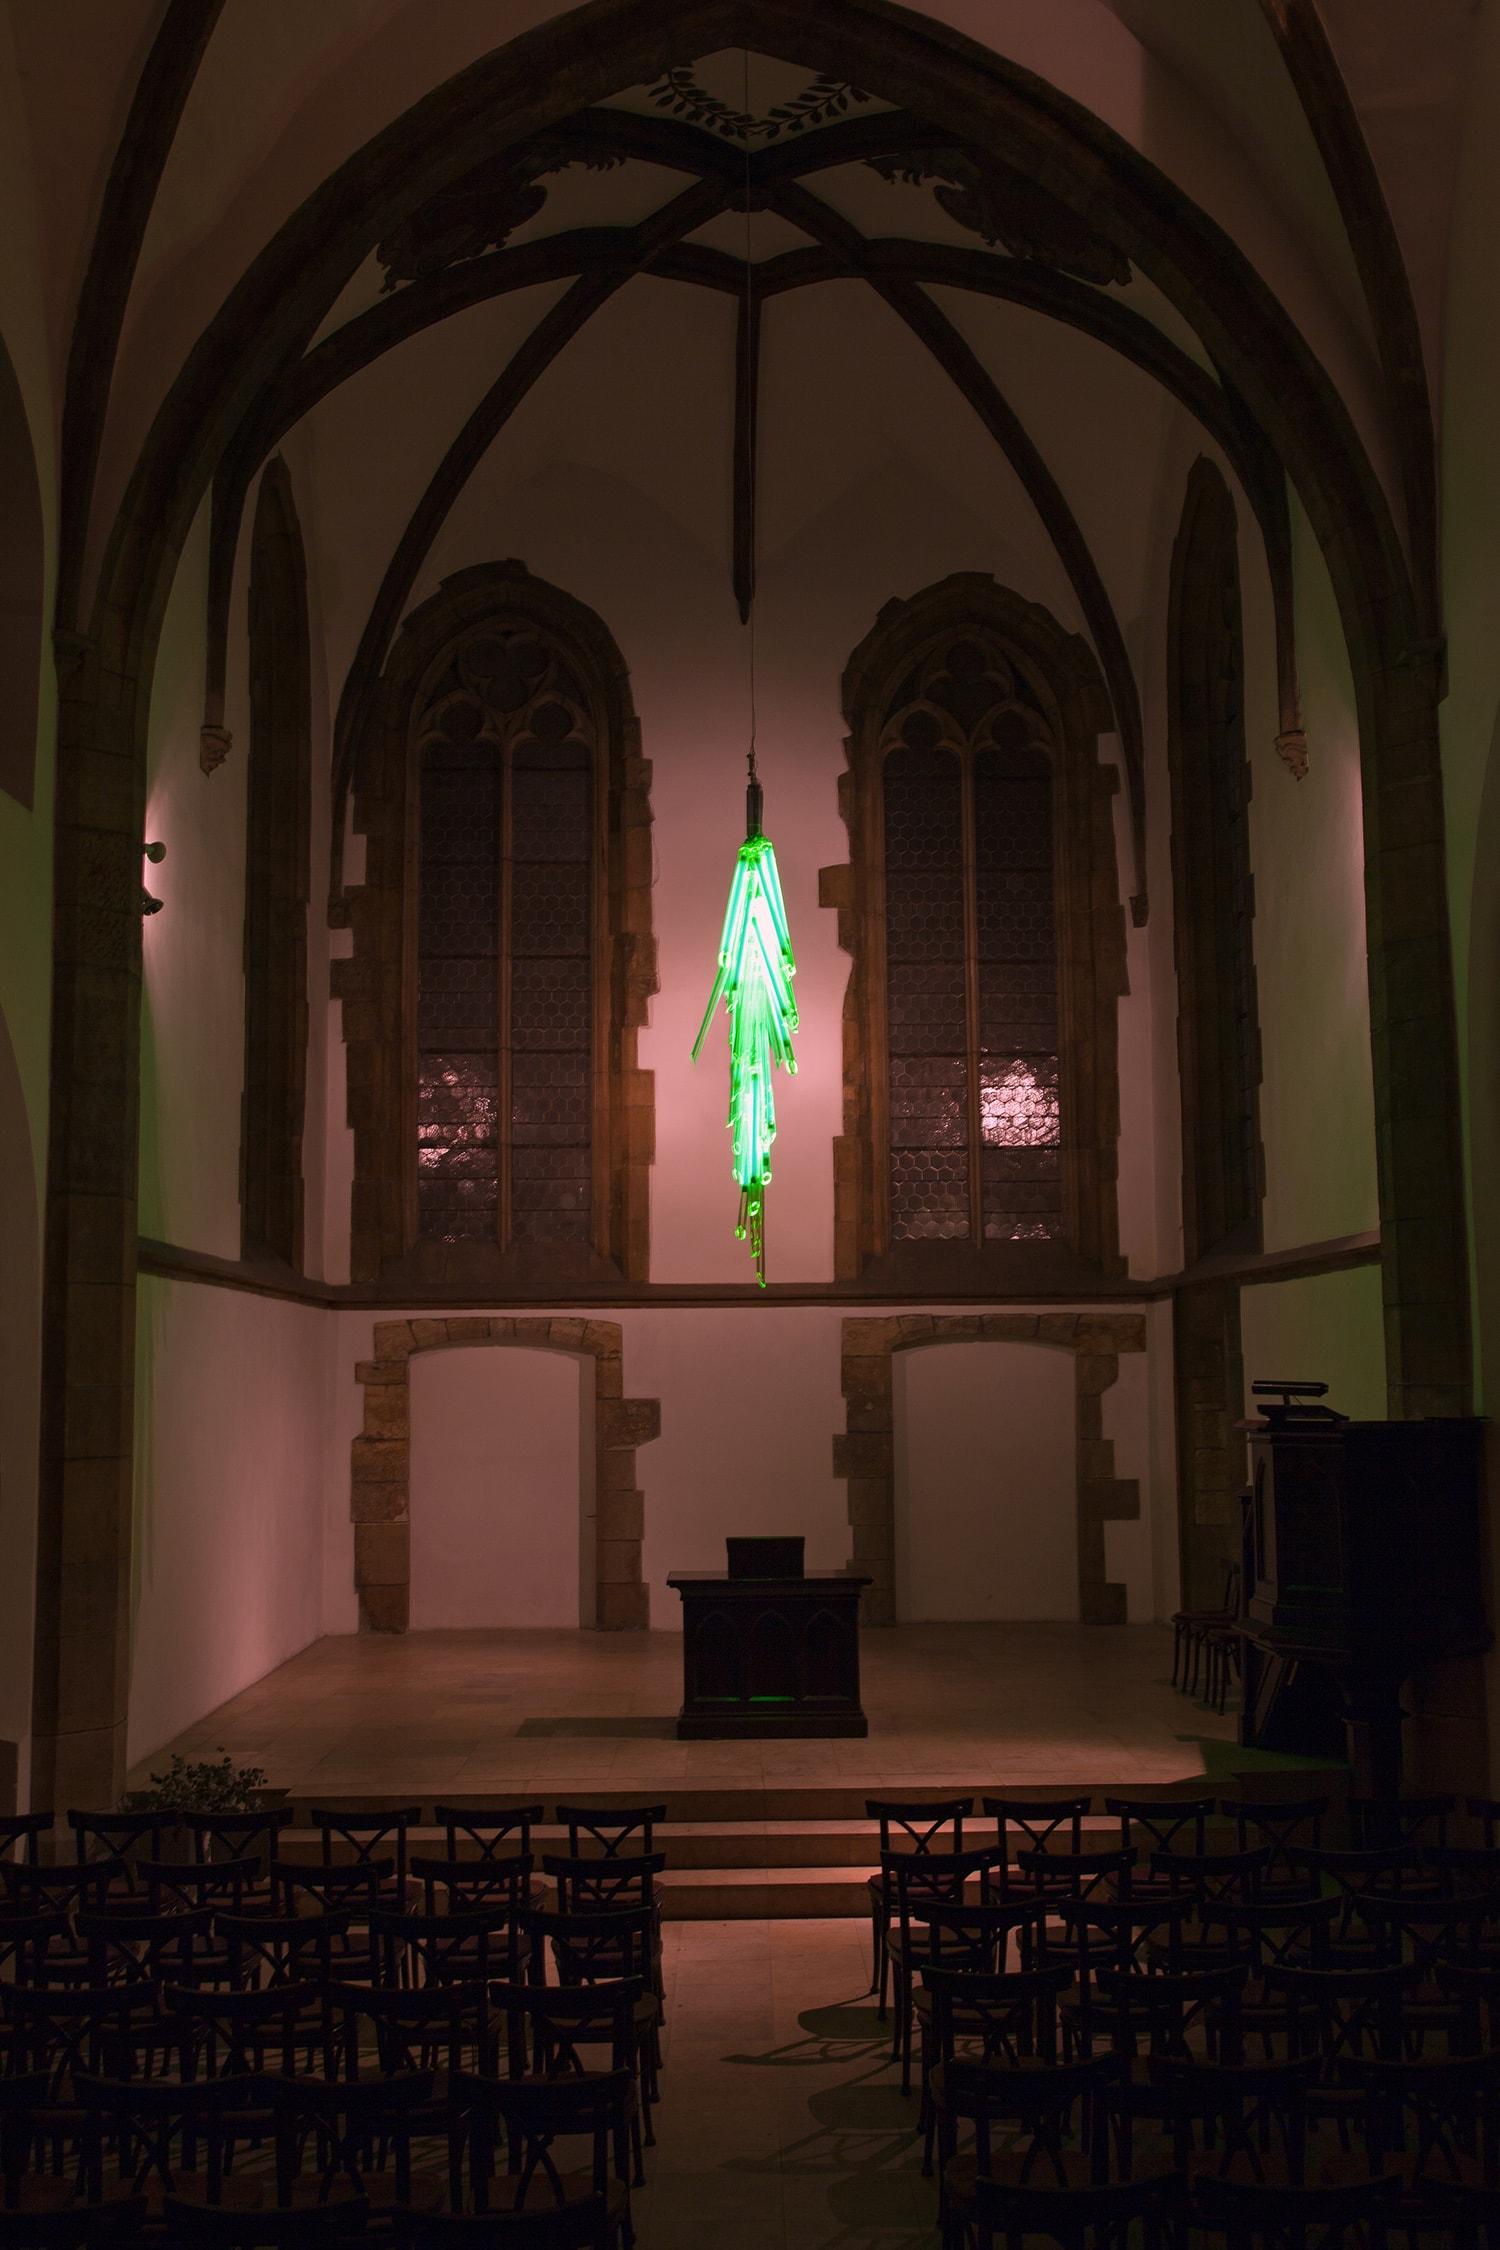 uran-glass-installation-signal-festival-lighting-object-saint-martin-church-sklo-instalace-světelný-objekt-kostel-svatého-martina-ve-zdi-design-rony-plesl-and-jiri-krejcirik-